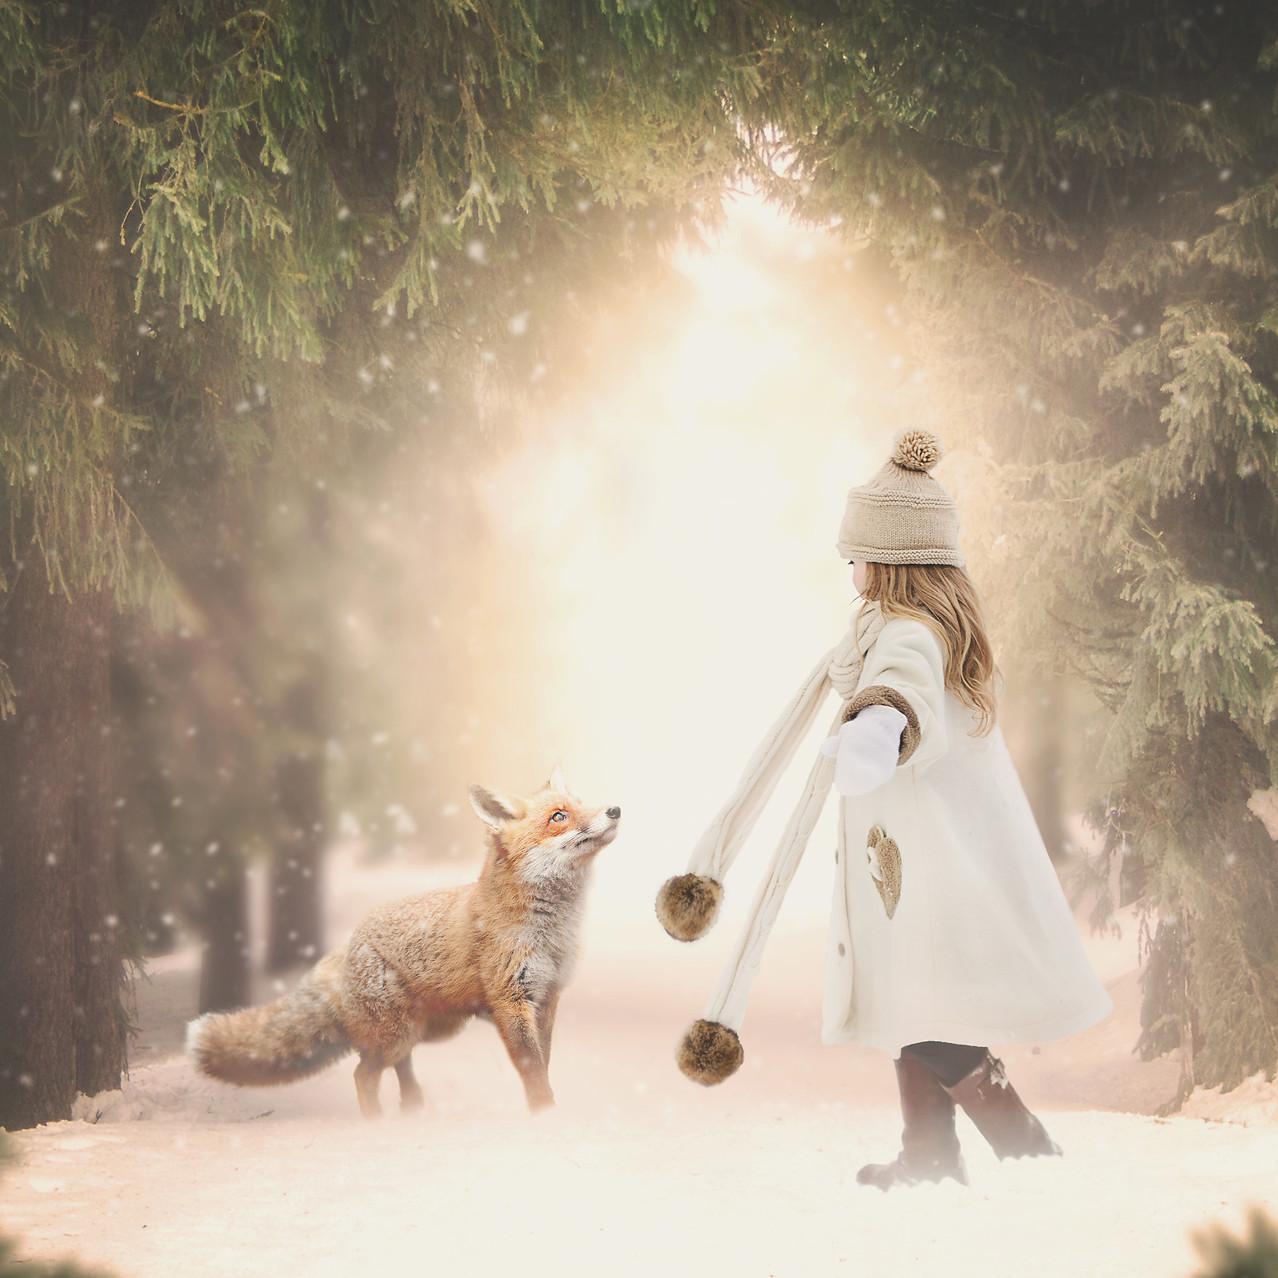 winter dance. Creative Children's Photography fantasy photoshoot, Dream Alice Photography & Art, Gold Coast